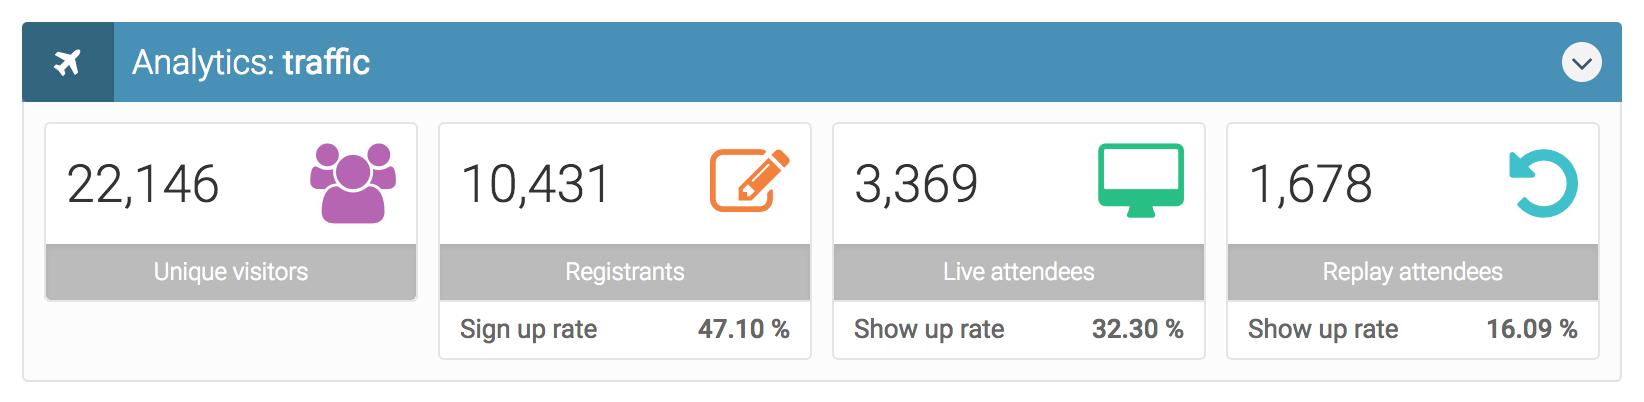 everwebinar traffic analytics